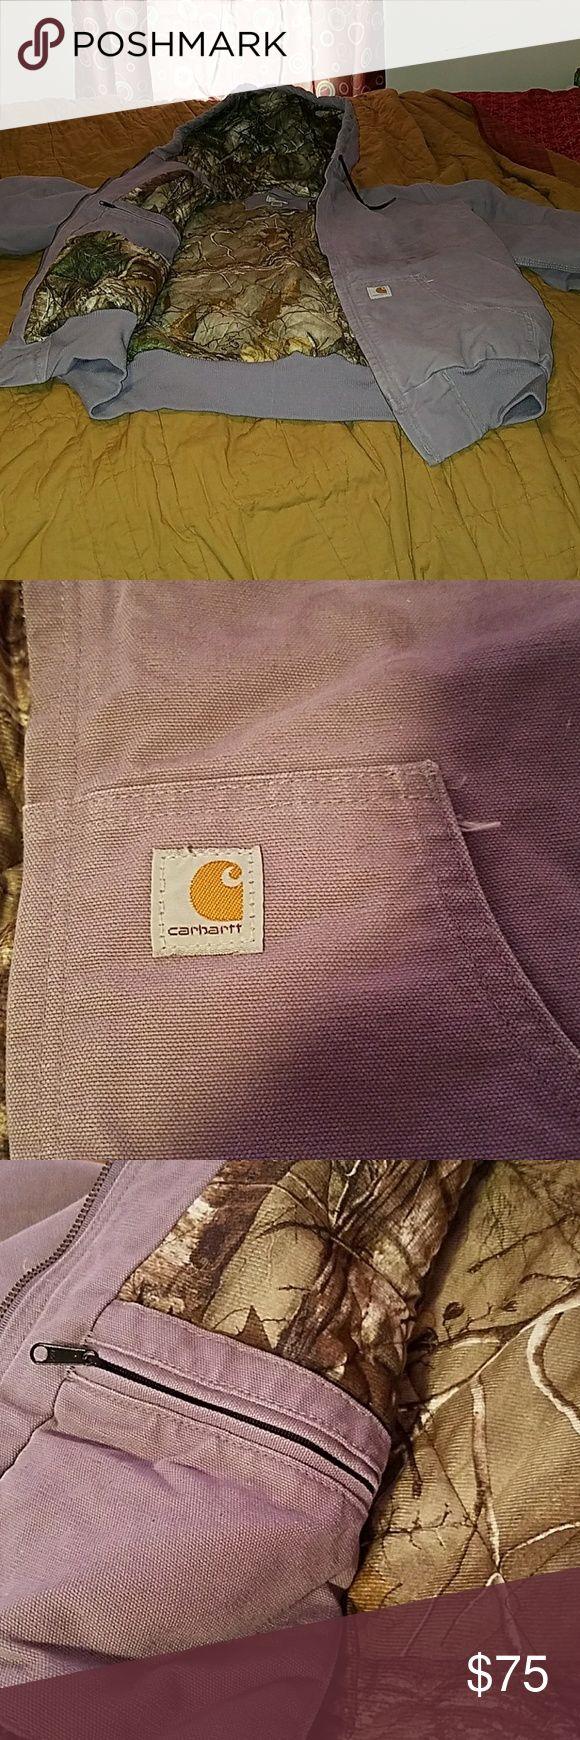 Carhartt coat Never worn.   New. Carhartt Jackets & Coats